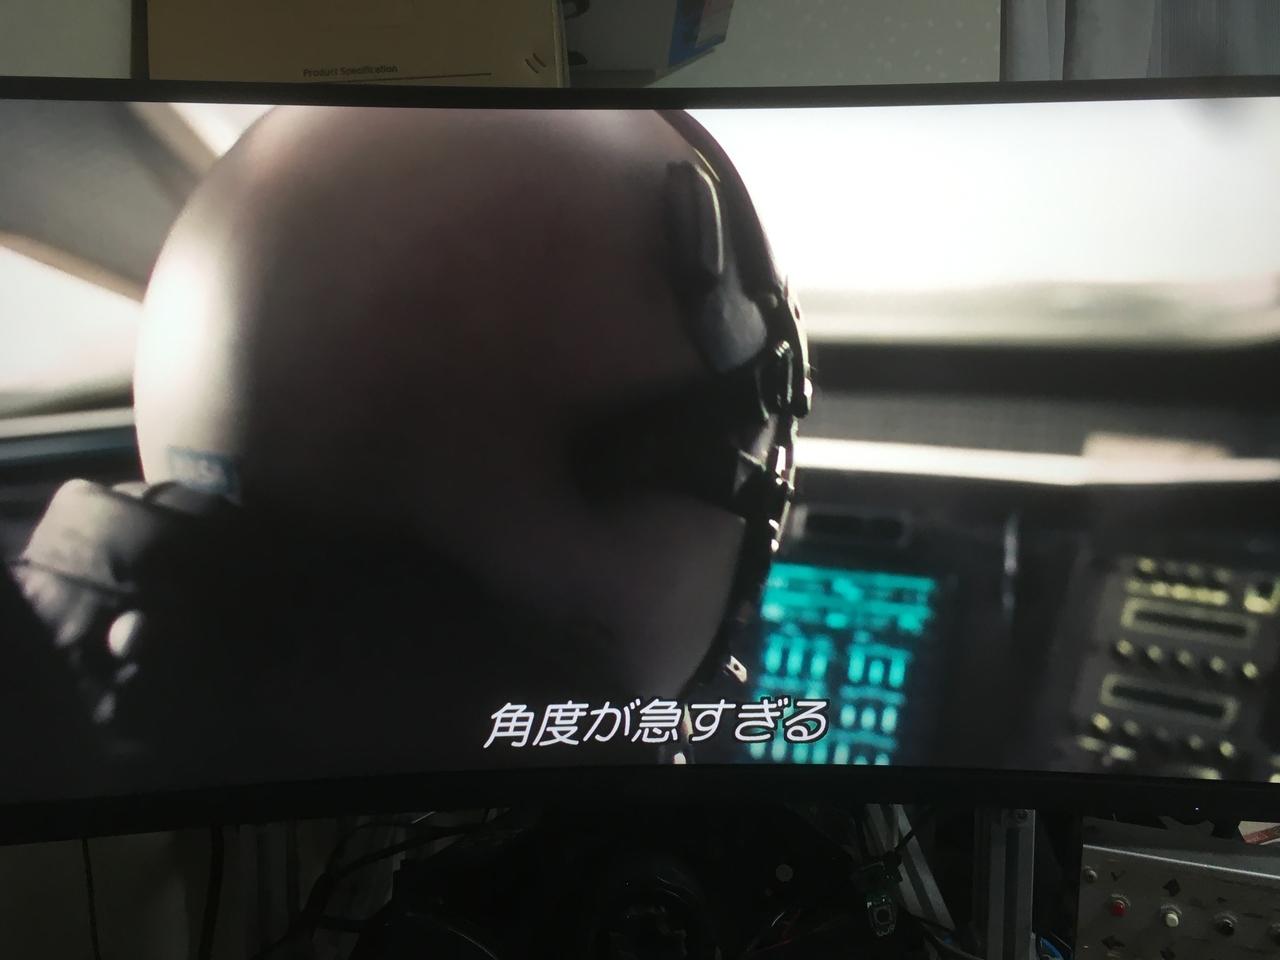 f:id:shutaro:20201010190308j:plain